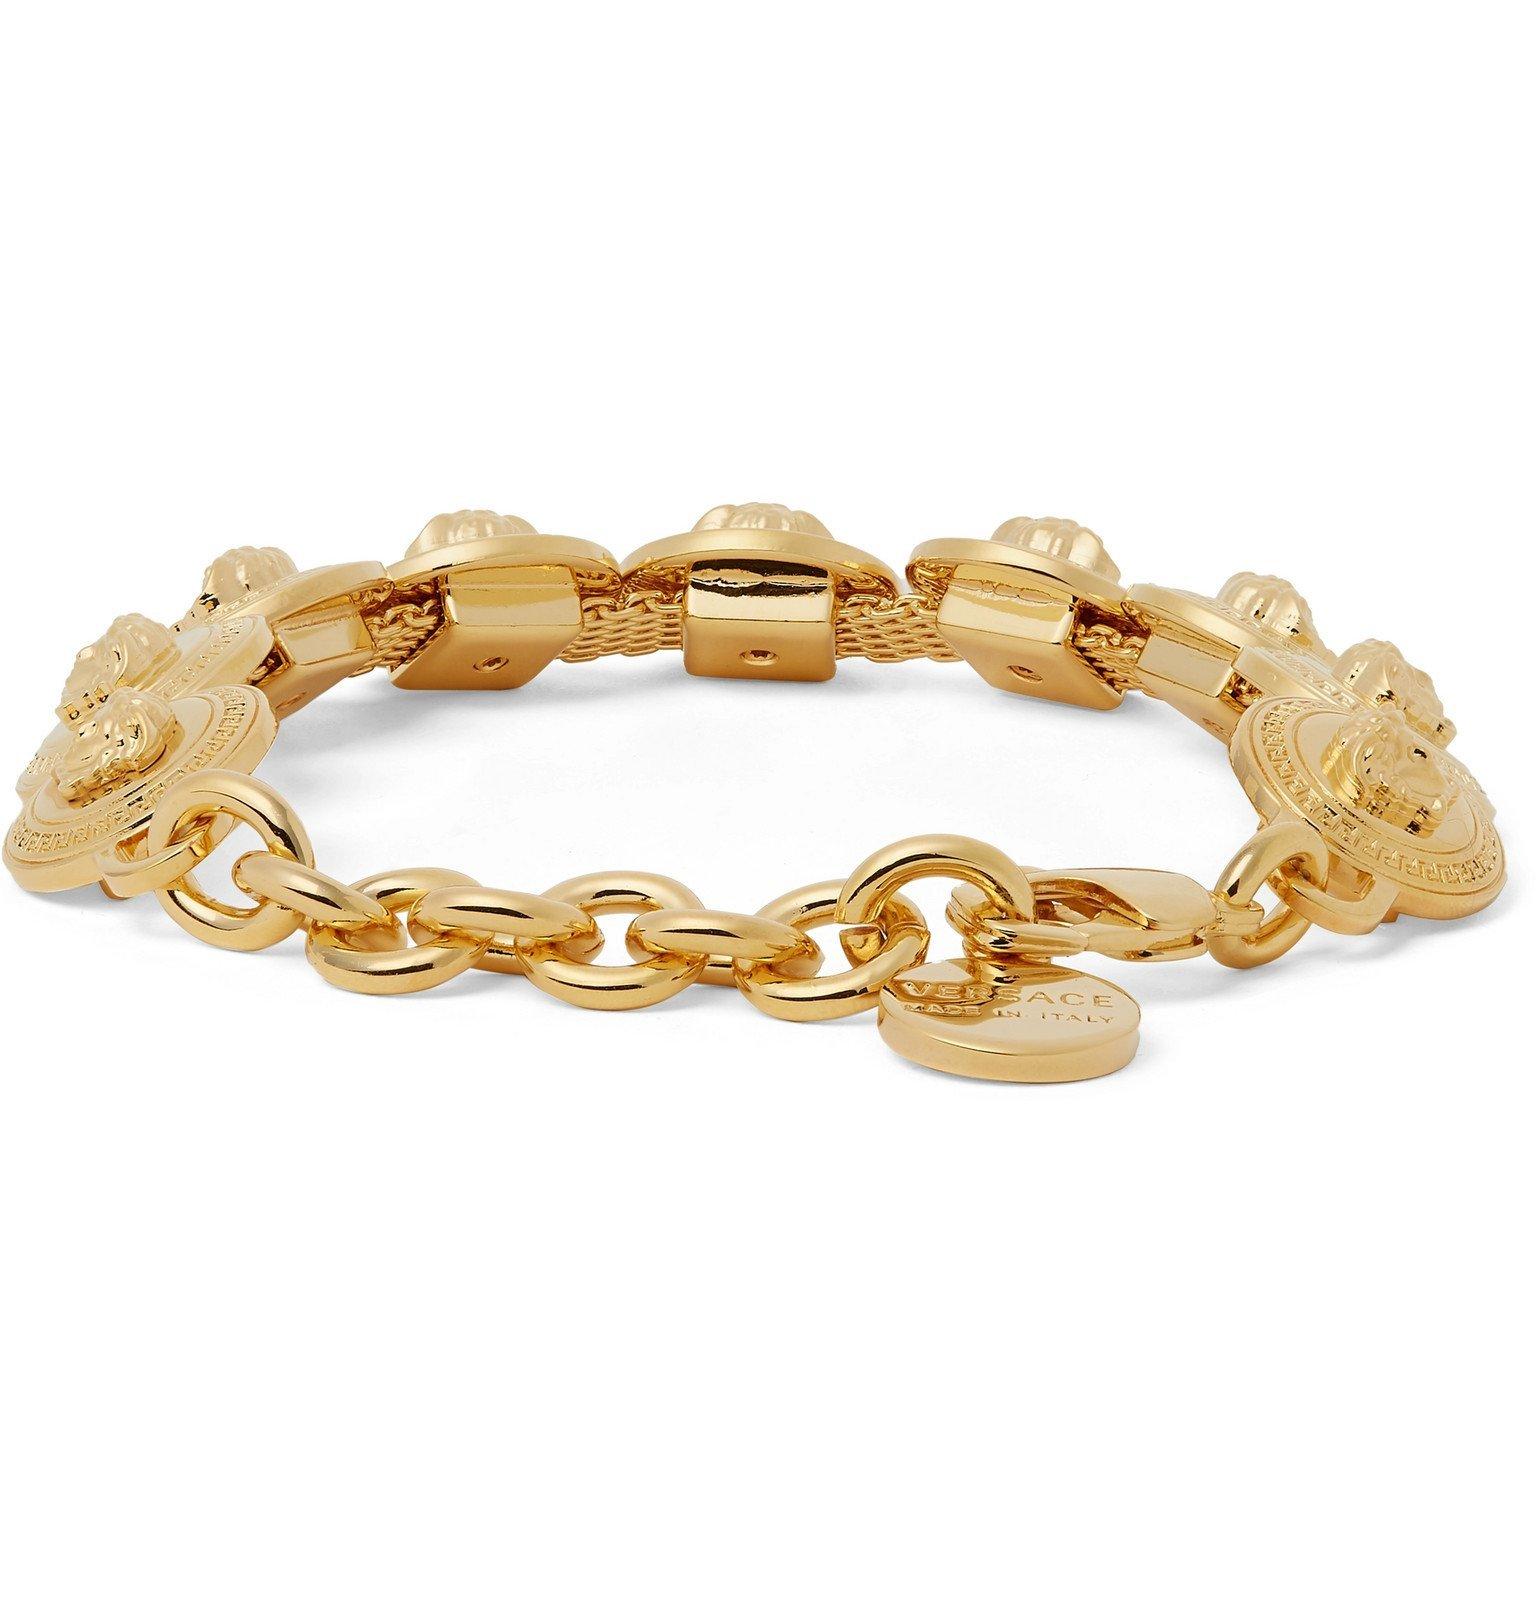 Versace - Gold-Tone Bracelet - Gold